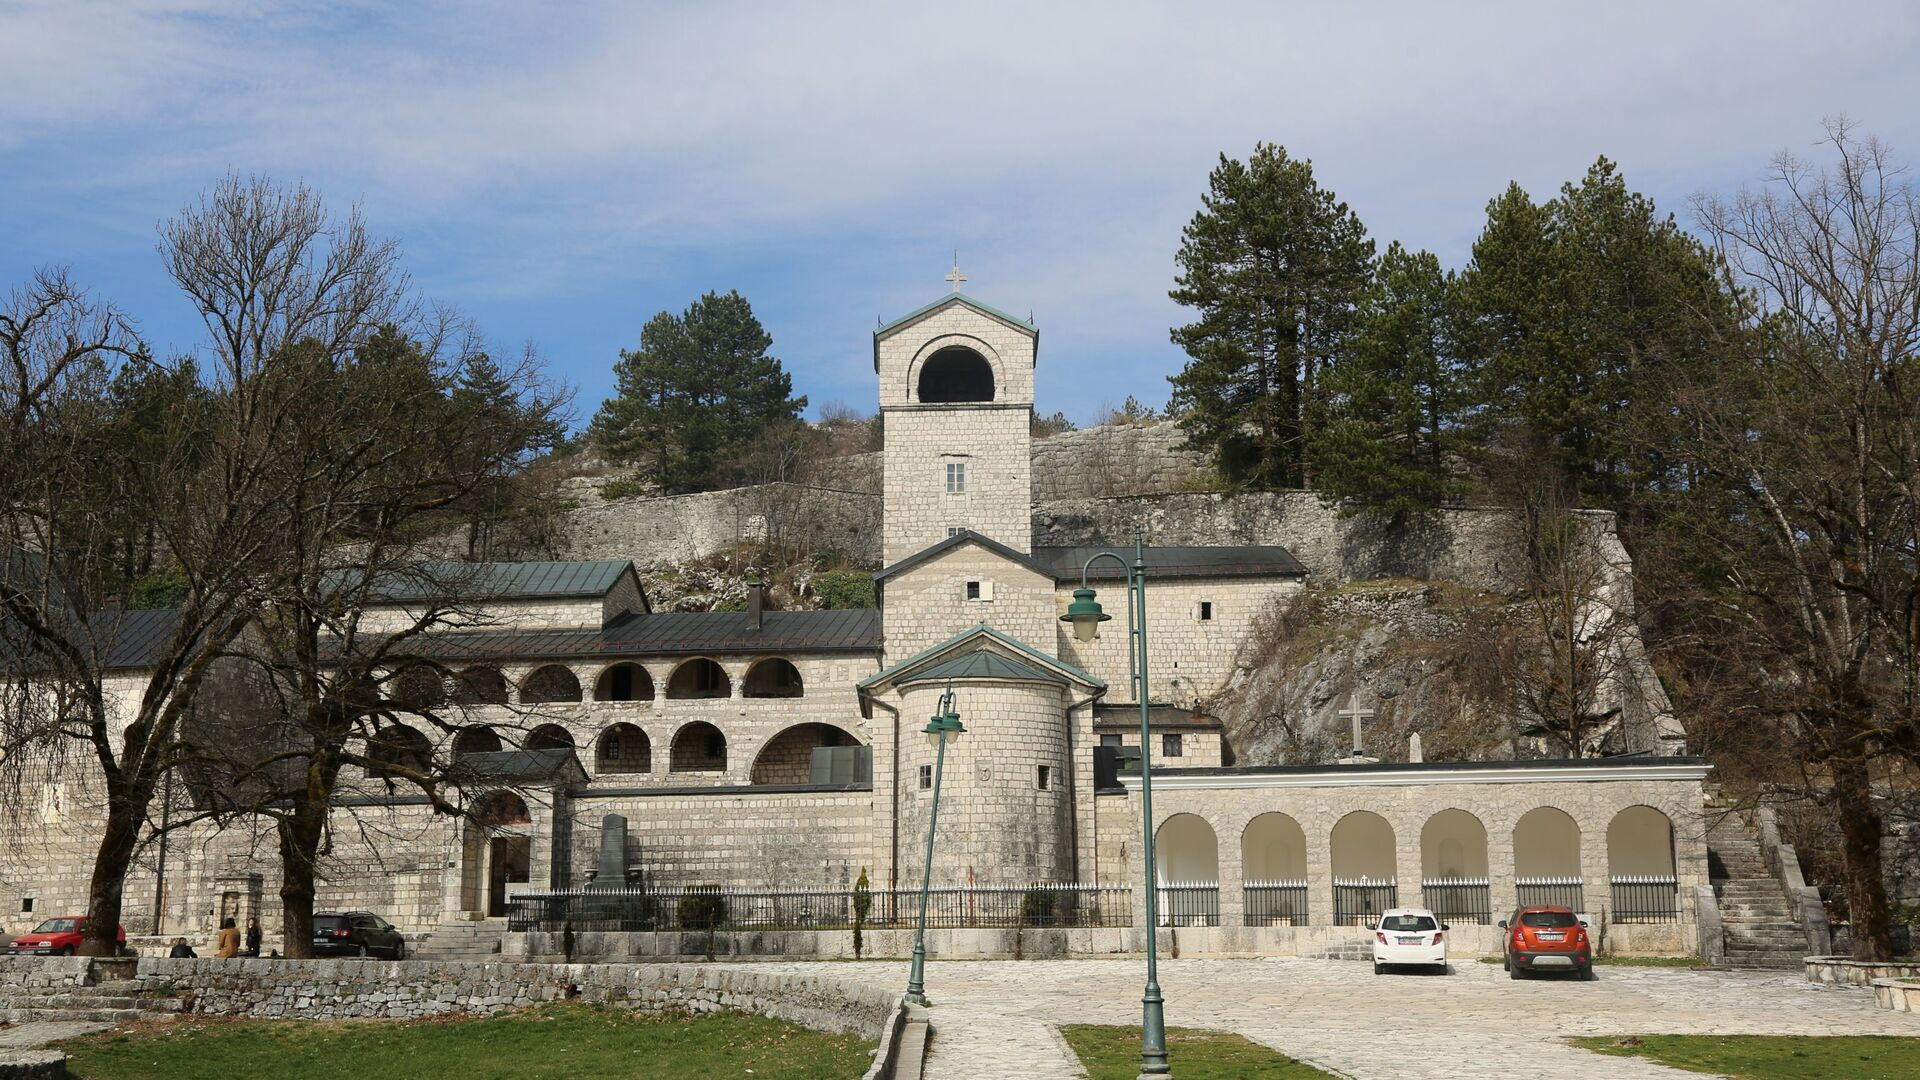 Цетињски манастир - Sputnik Србија, 1920, 02.09.2021